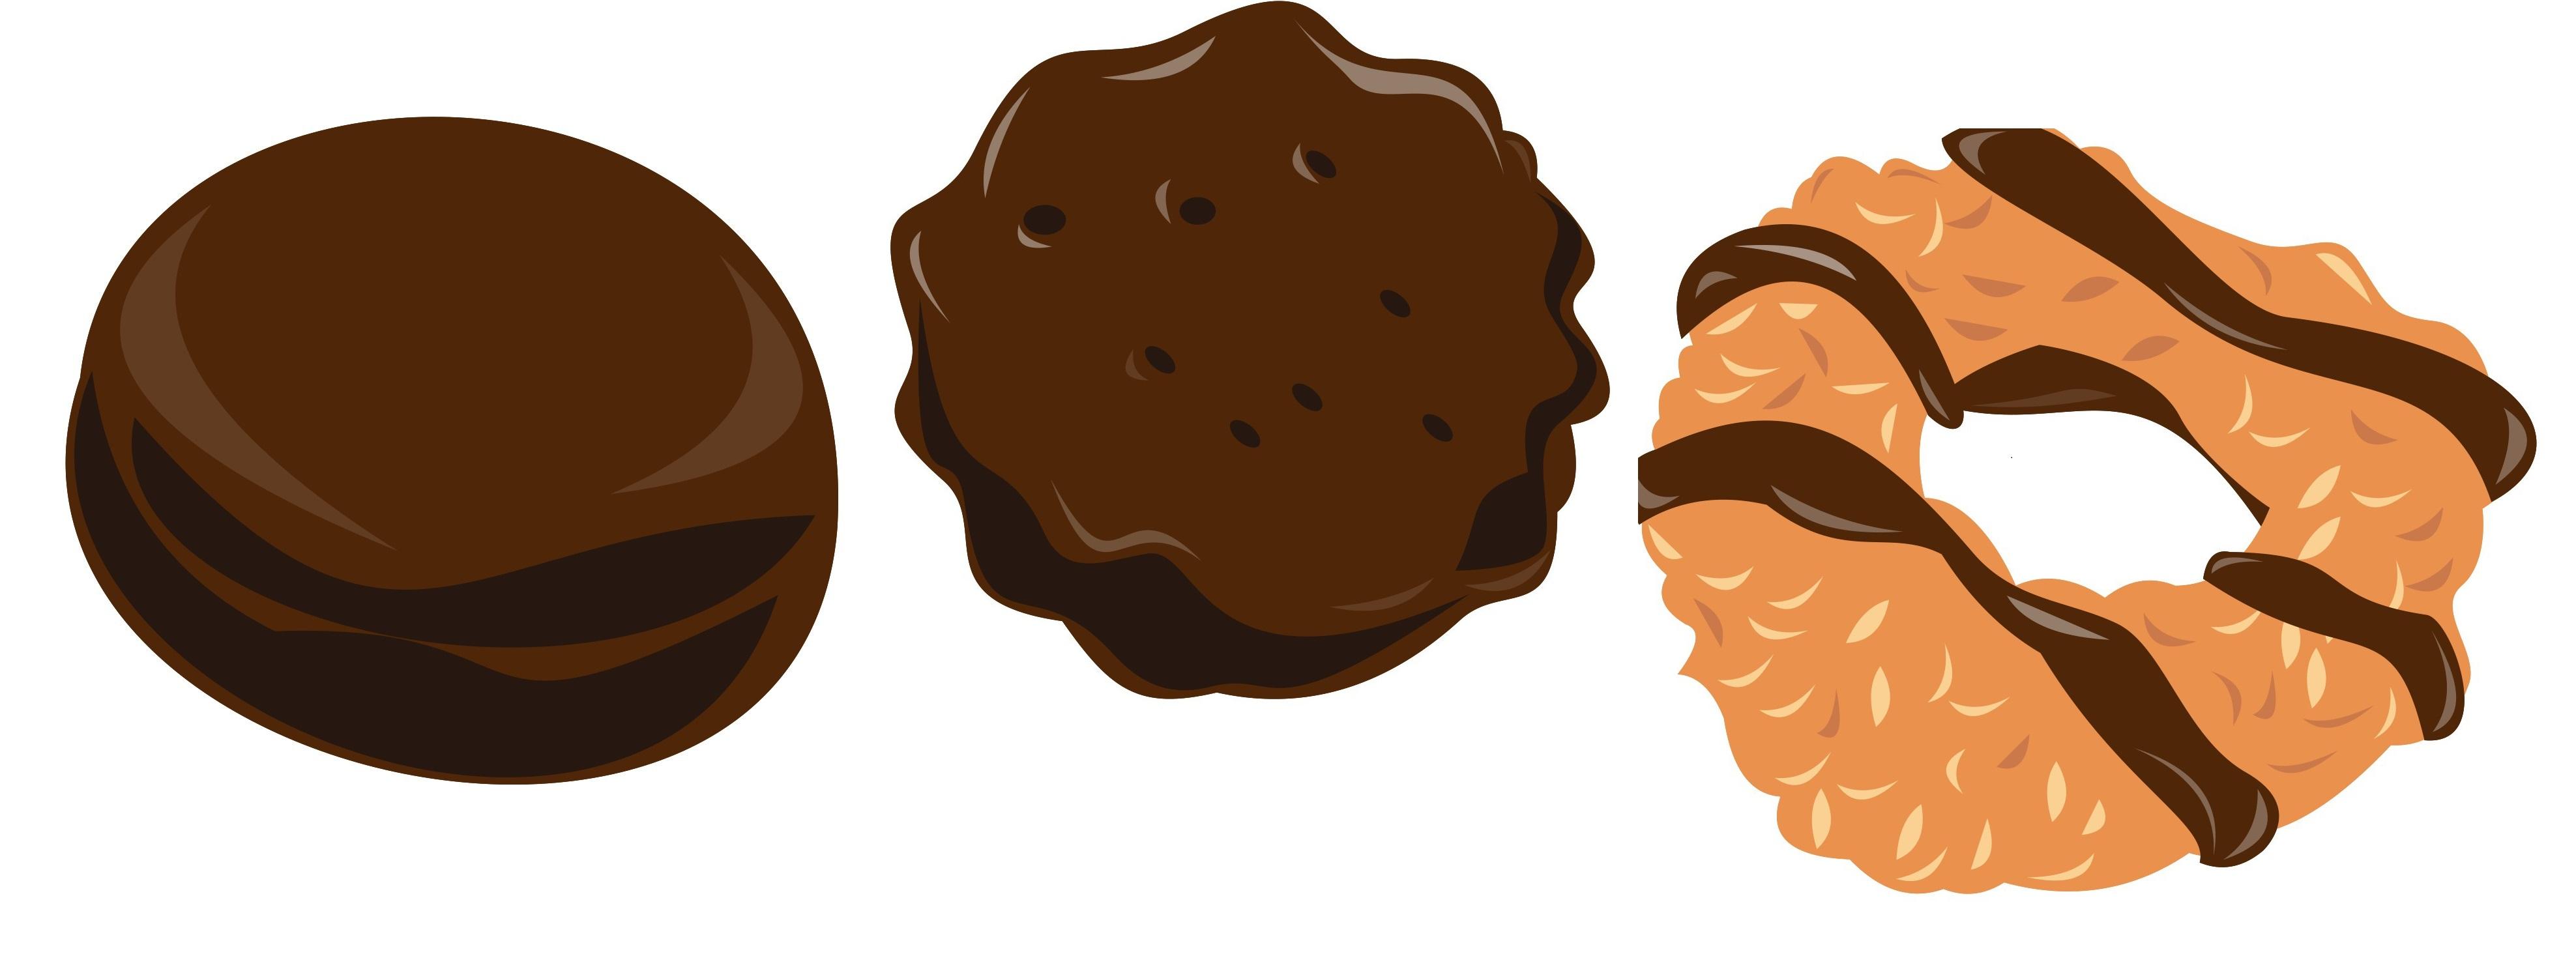 thin mint cookies atlas indicators investment advisors rh atlasindicators com girl scout cookie border clip art girl scout cookie border clip art